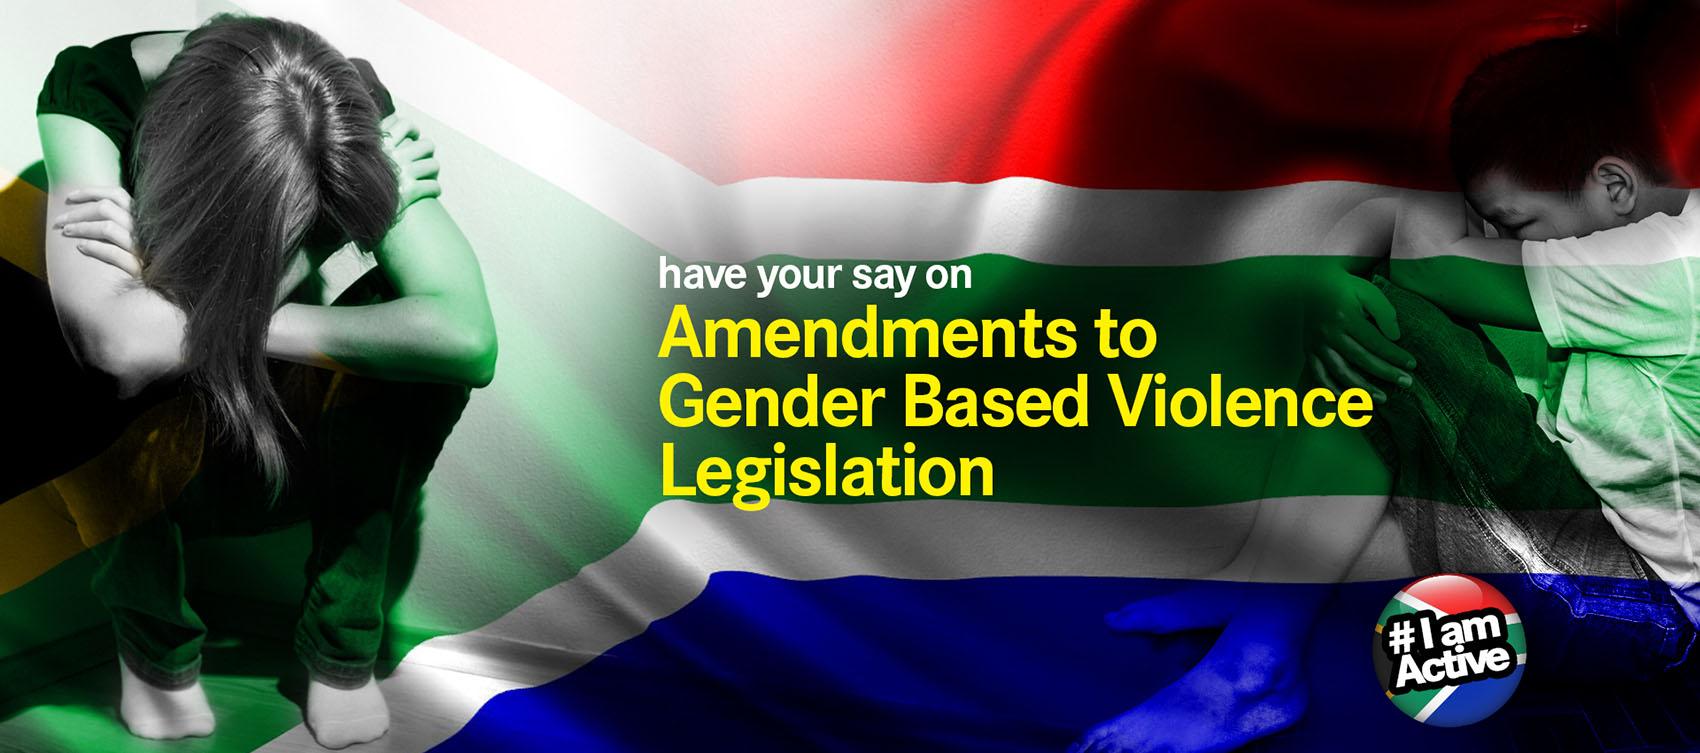 DearSA-GBV-bills